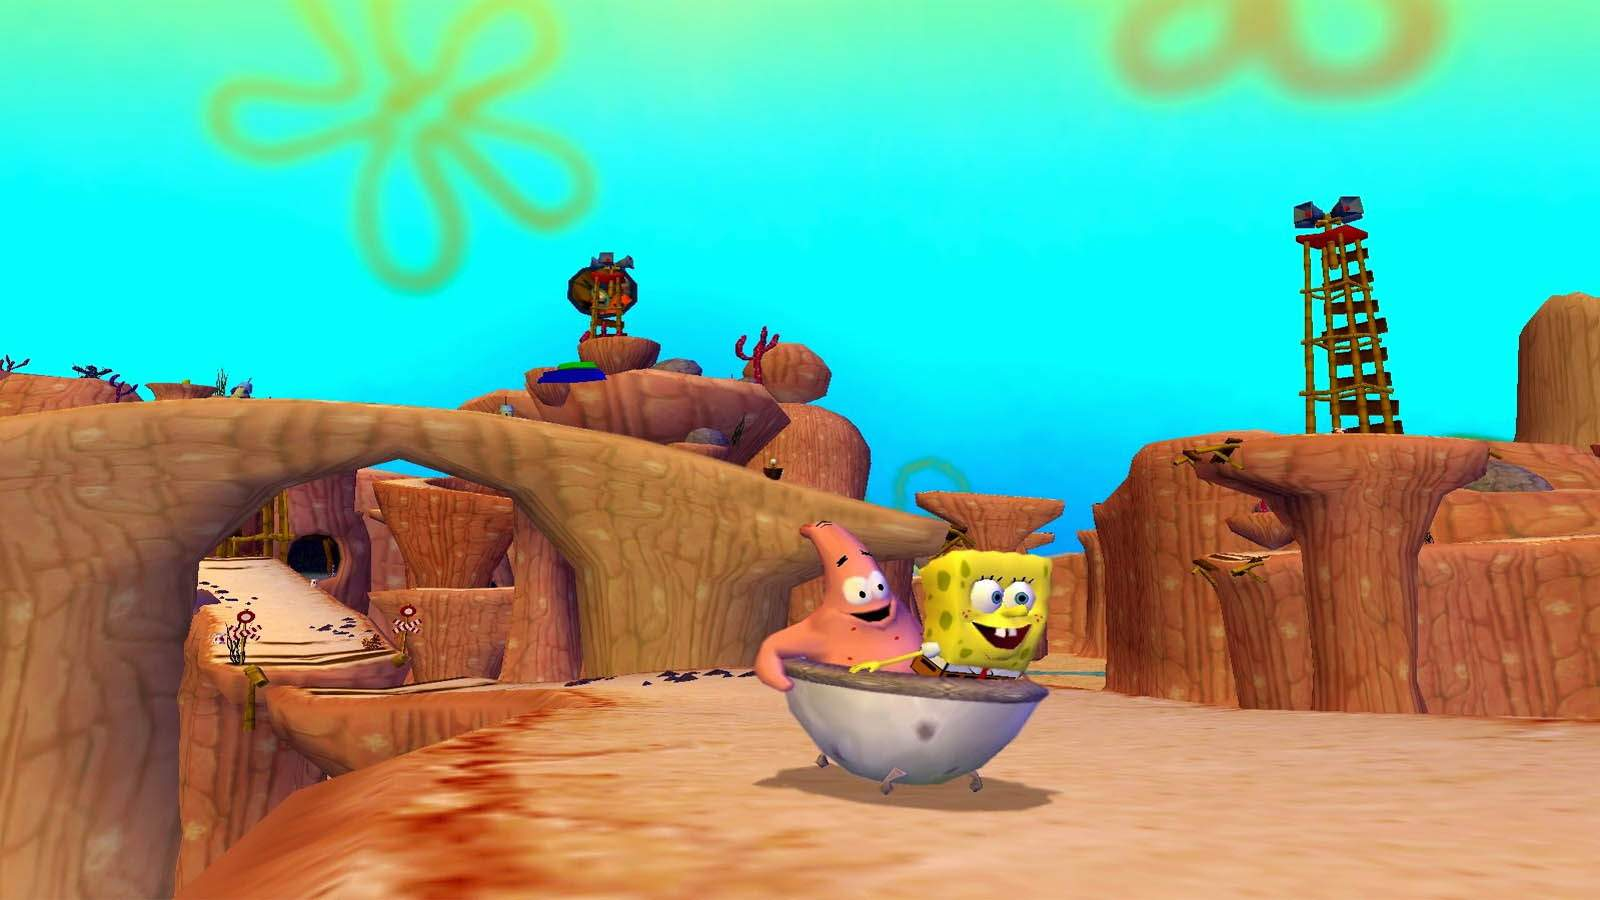 تحميل لعبة SpongeBob SquarePants مضغوطة برابط واحد مباشر كاملة مجانا